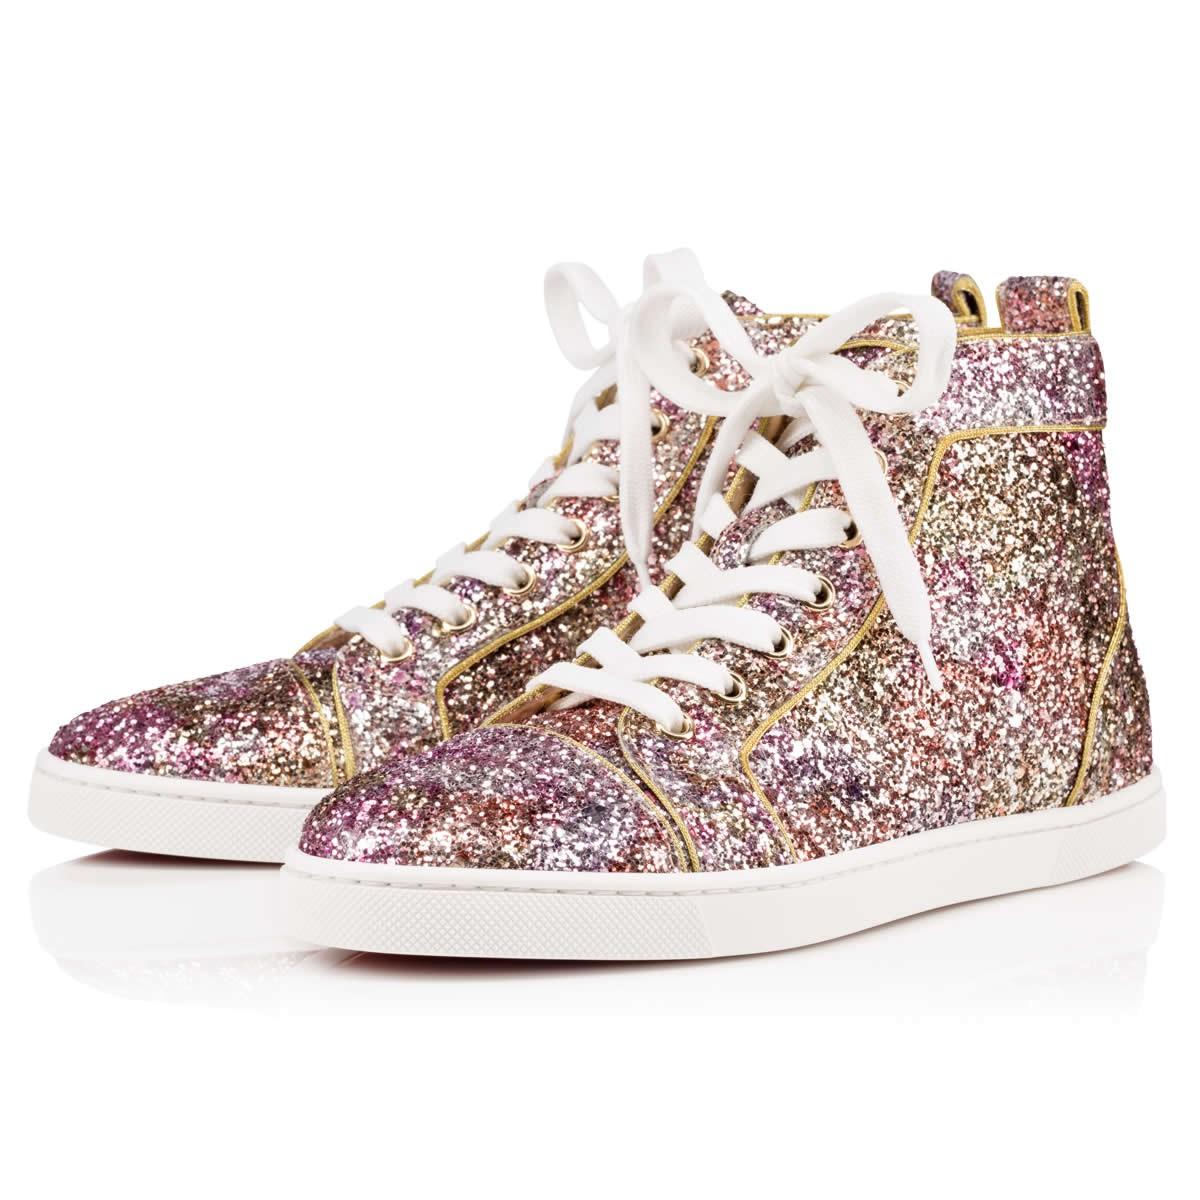 christian louboutin bip bip glitter sneakers